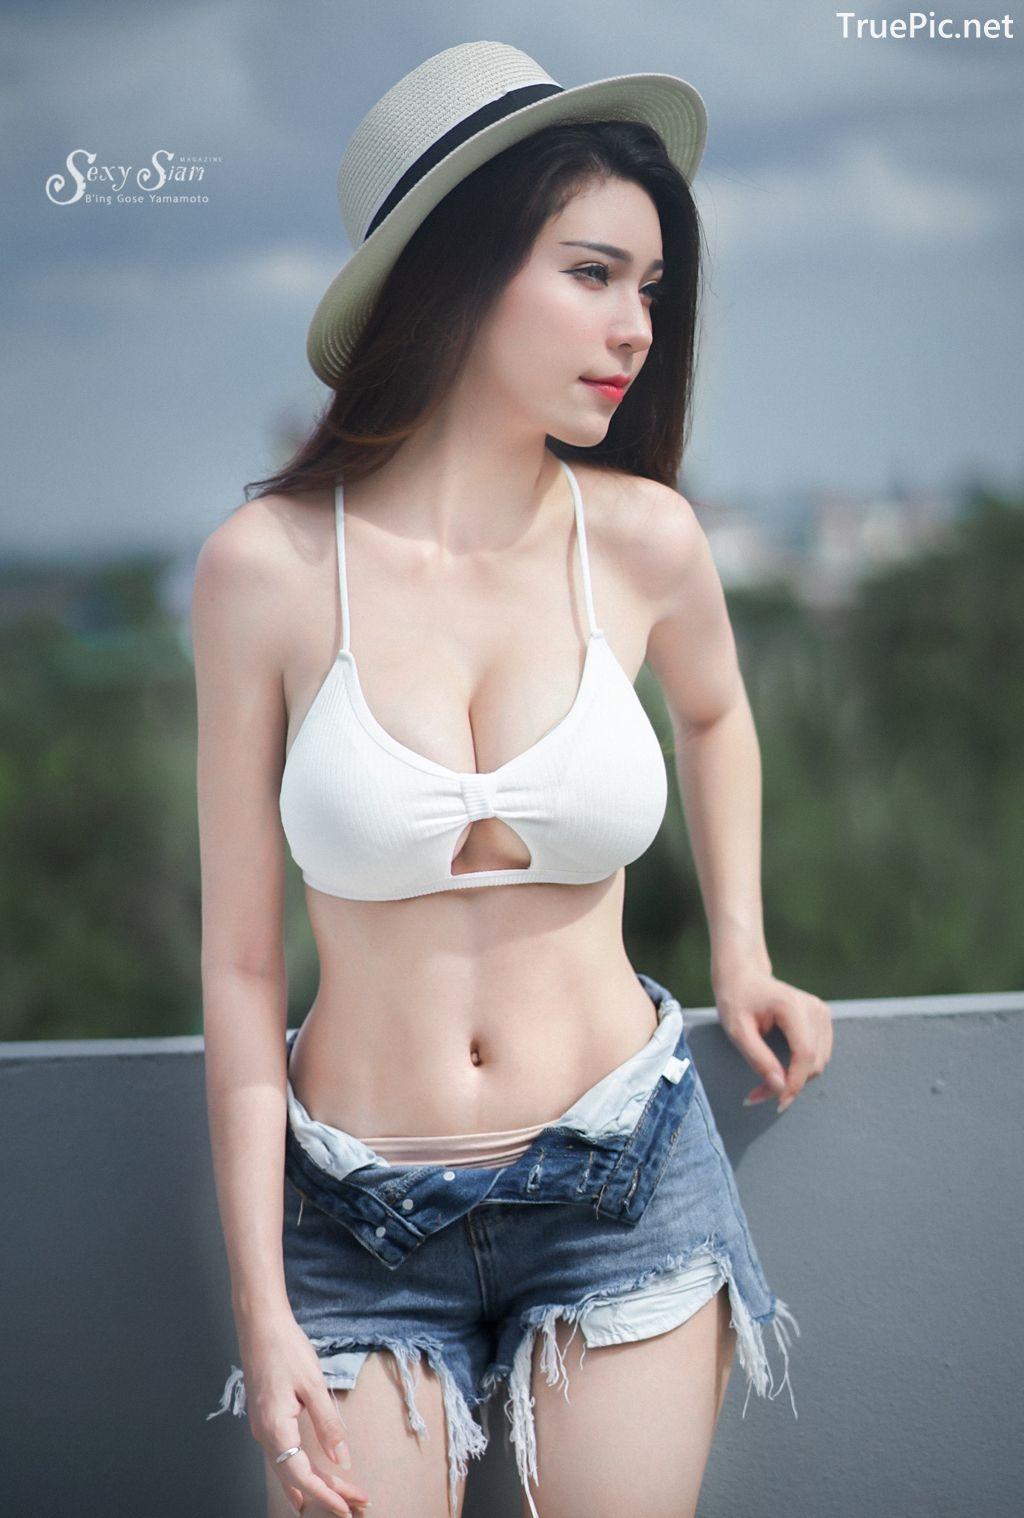 Image-Thailand Sexy Model-Janet-Kanokwan-Saesim-White-Bra-And-Jean-TruePic.net- Picture-2